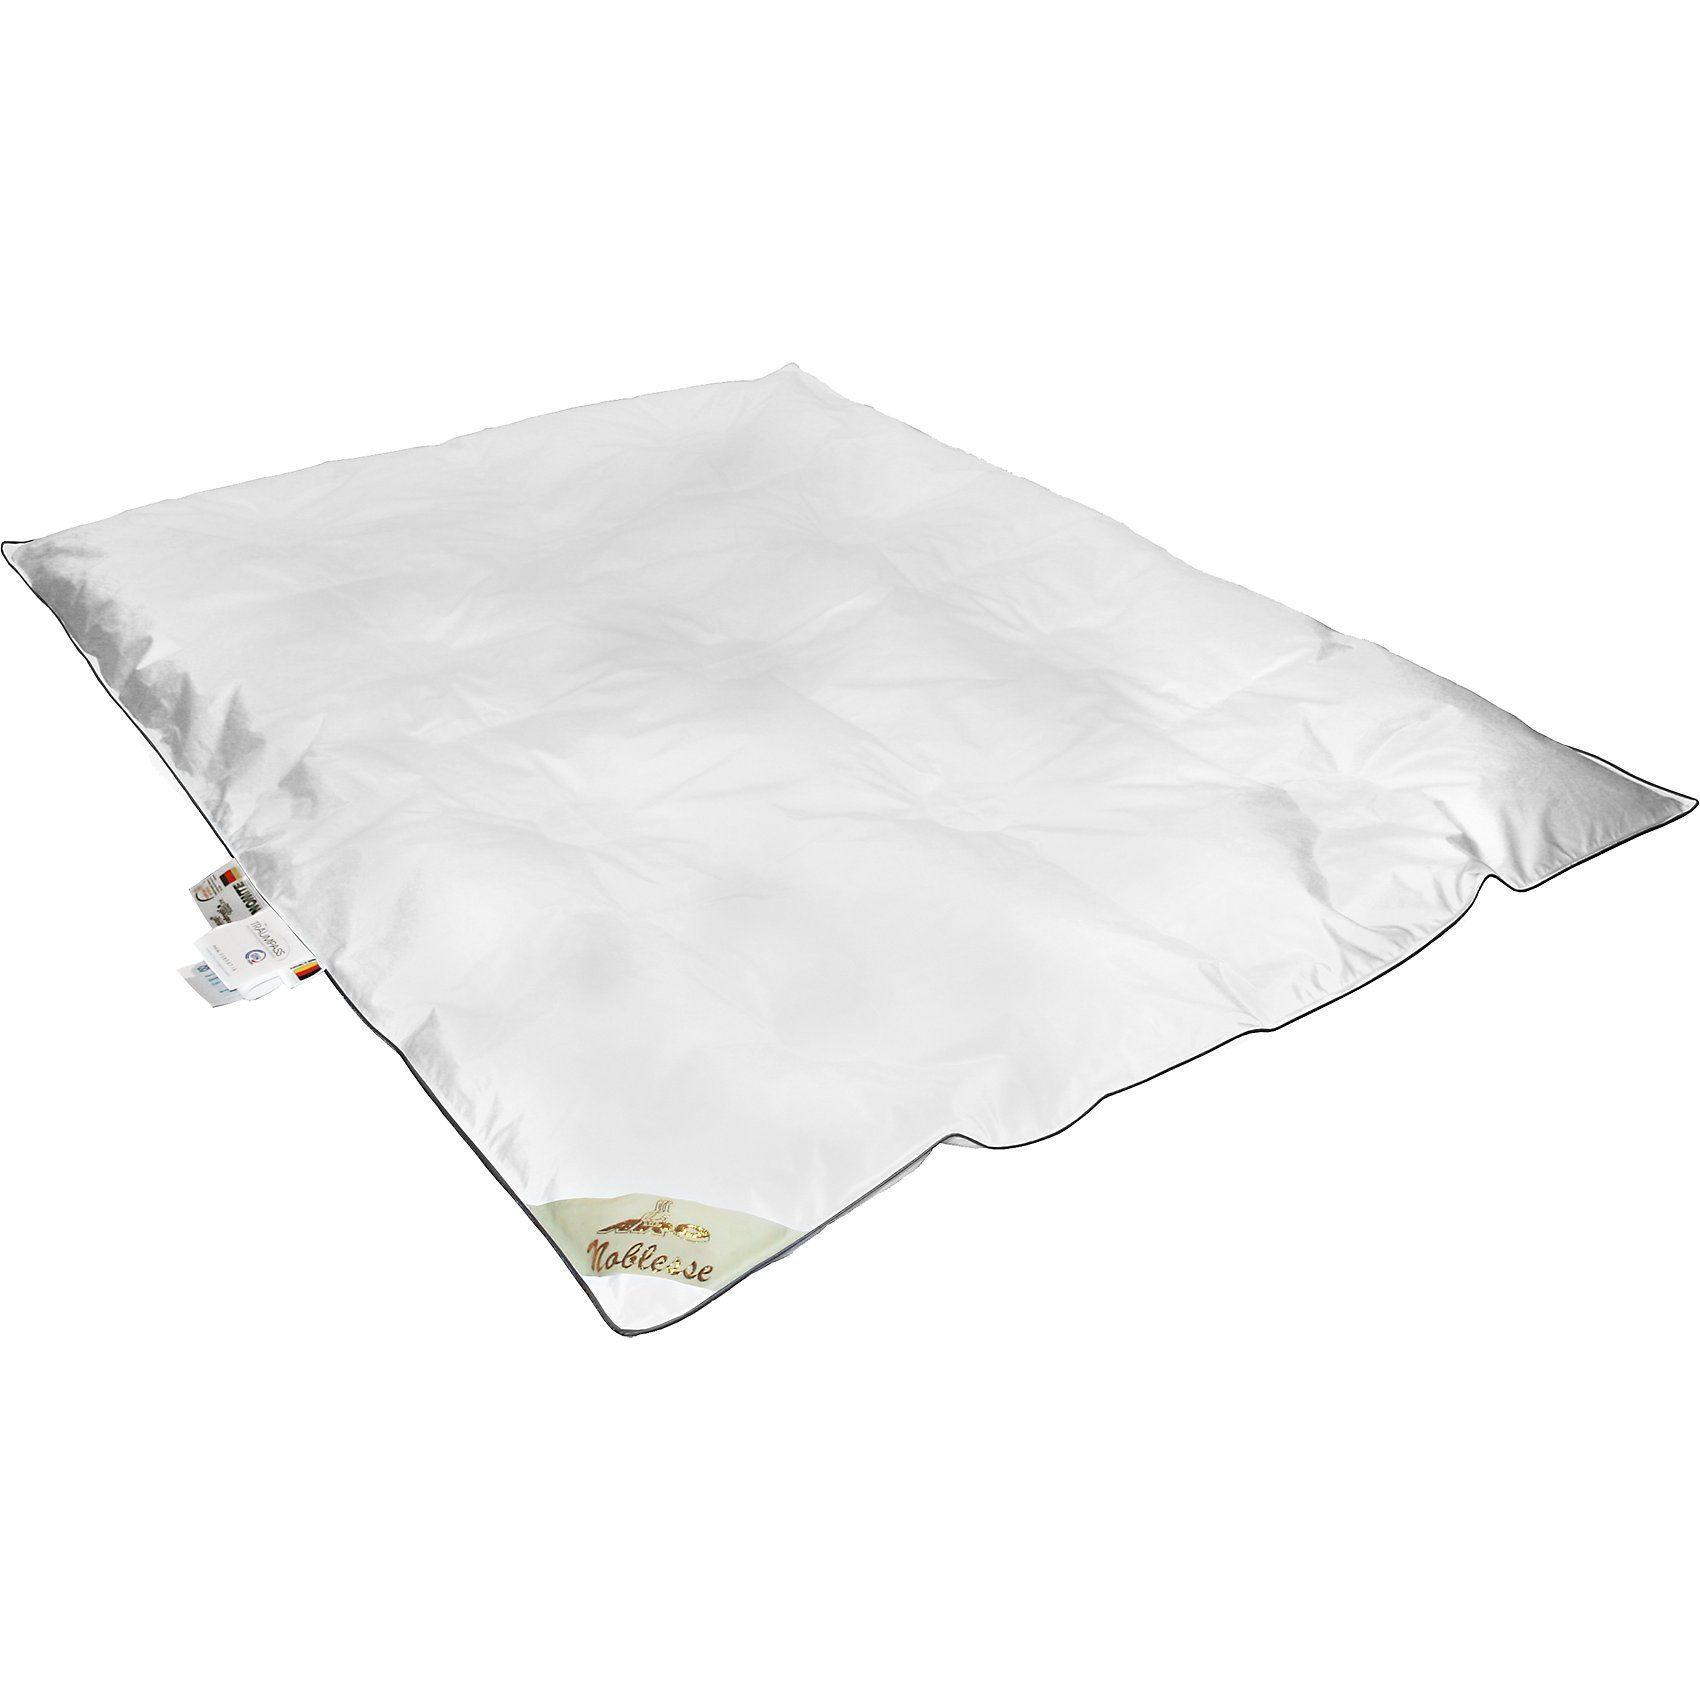 Artländer Kinder Bettdecke NOBLESSE, Daunen (90%), 100 x 135 cm